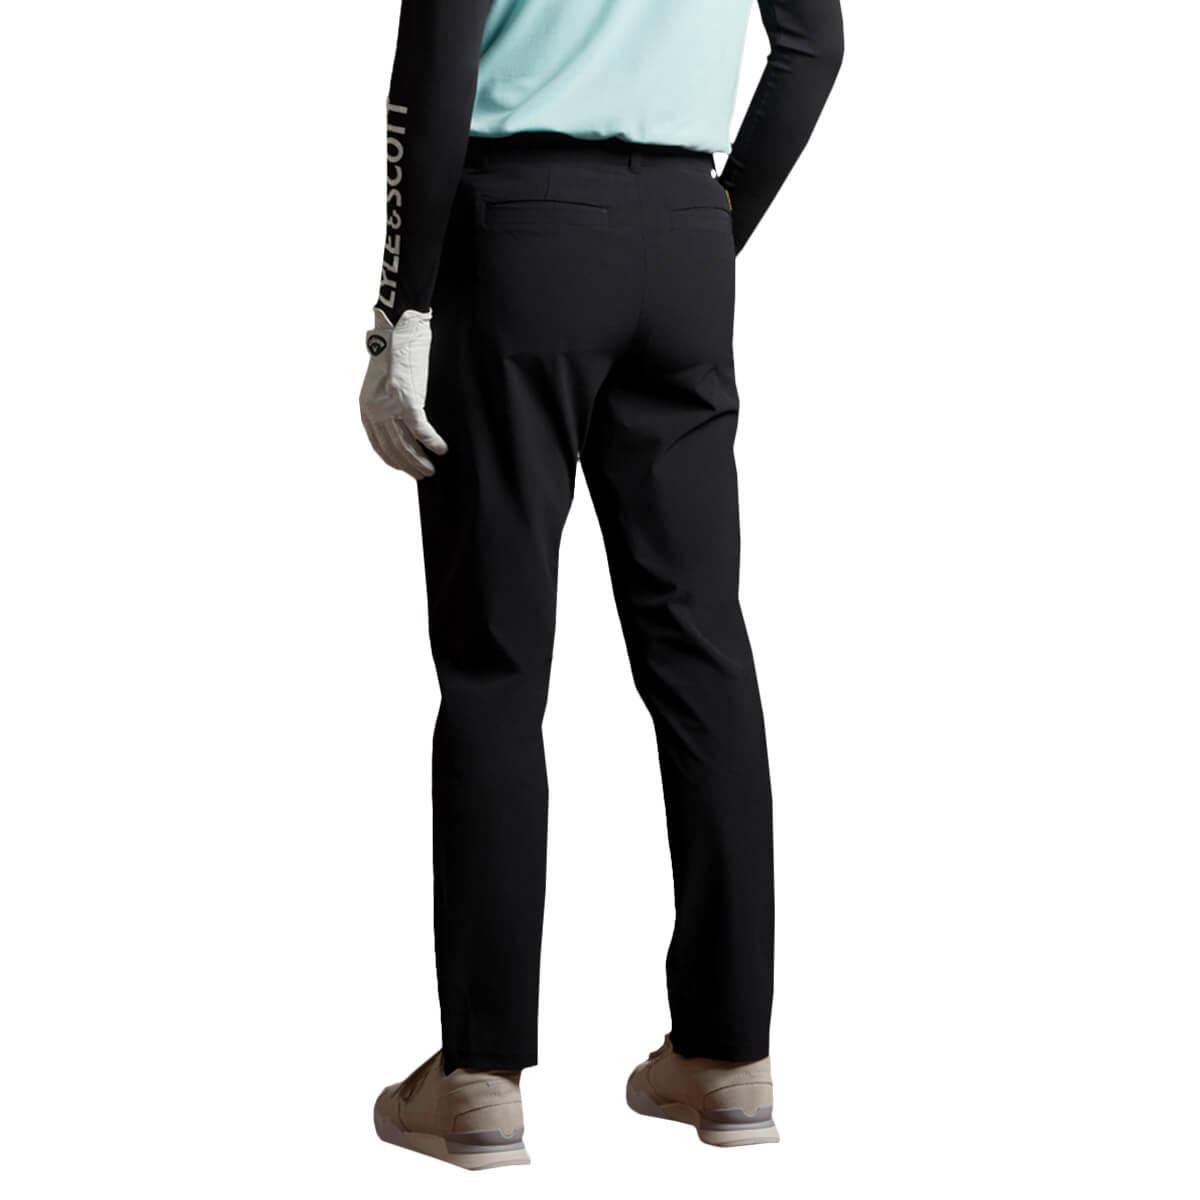 thumbnail 11 - Lyle & Scott Mens Golf Tech Light Stretch Breathable Trousers 55% OFF RRP